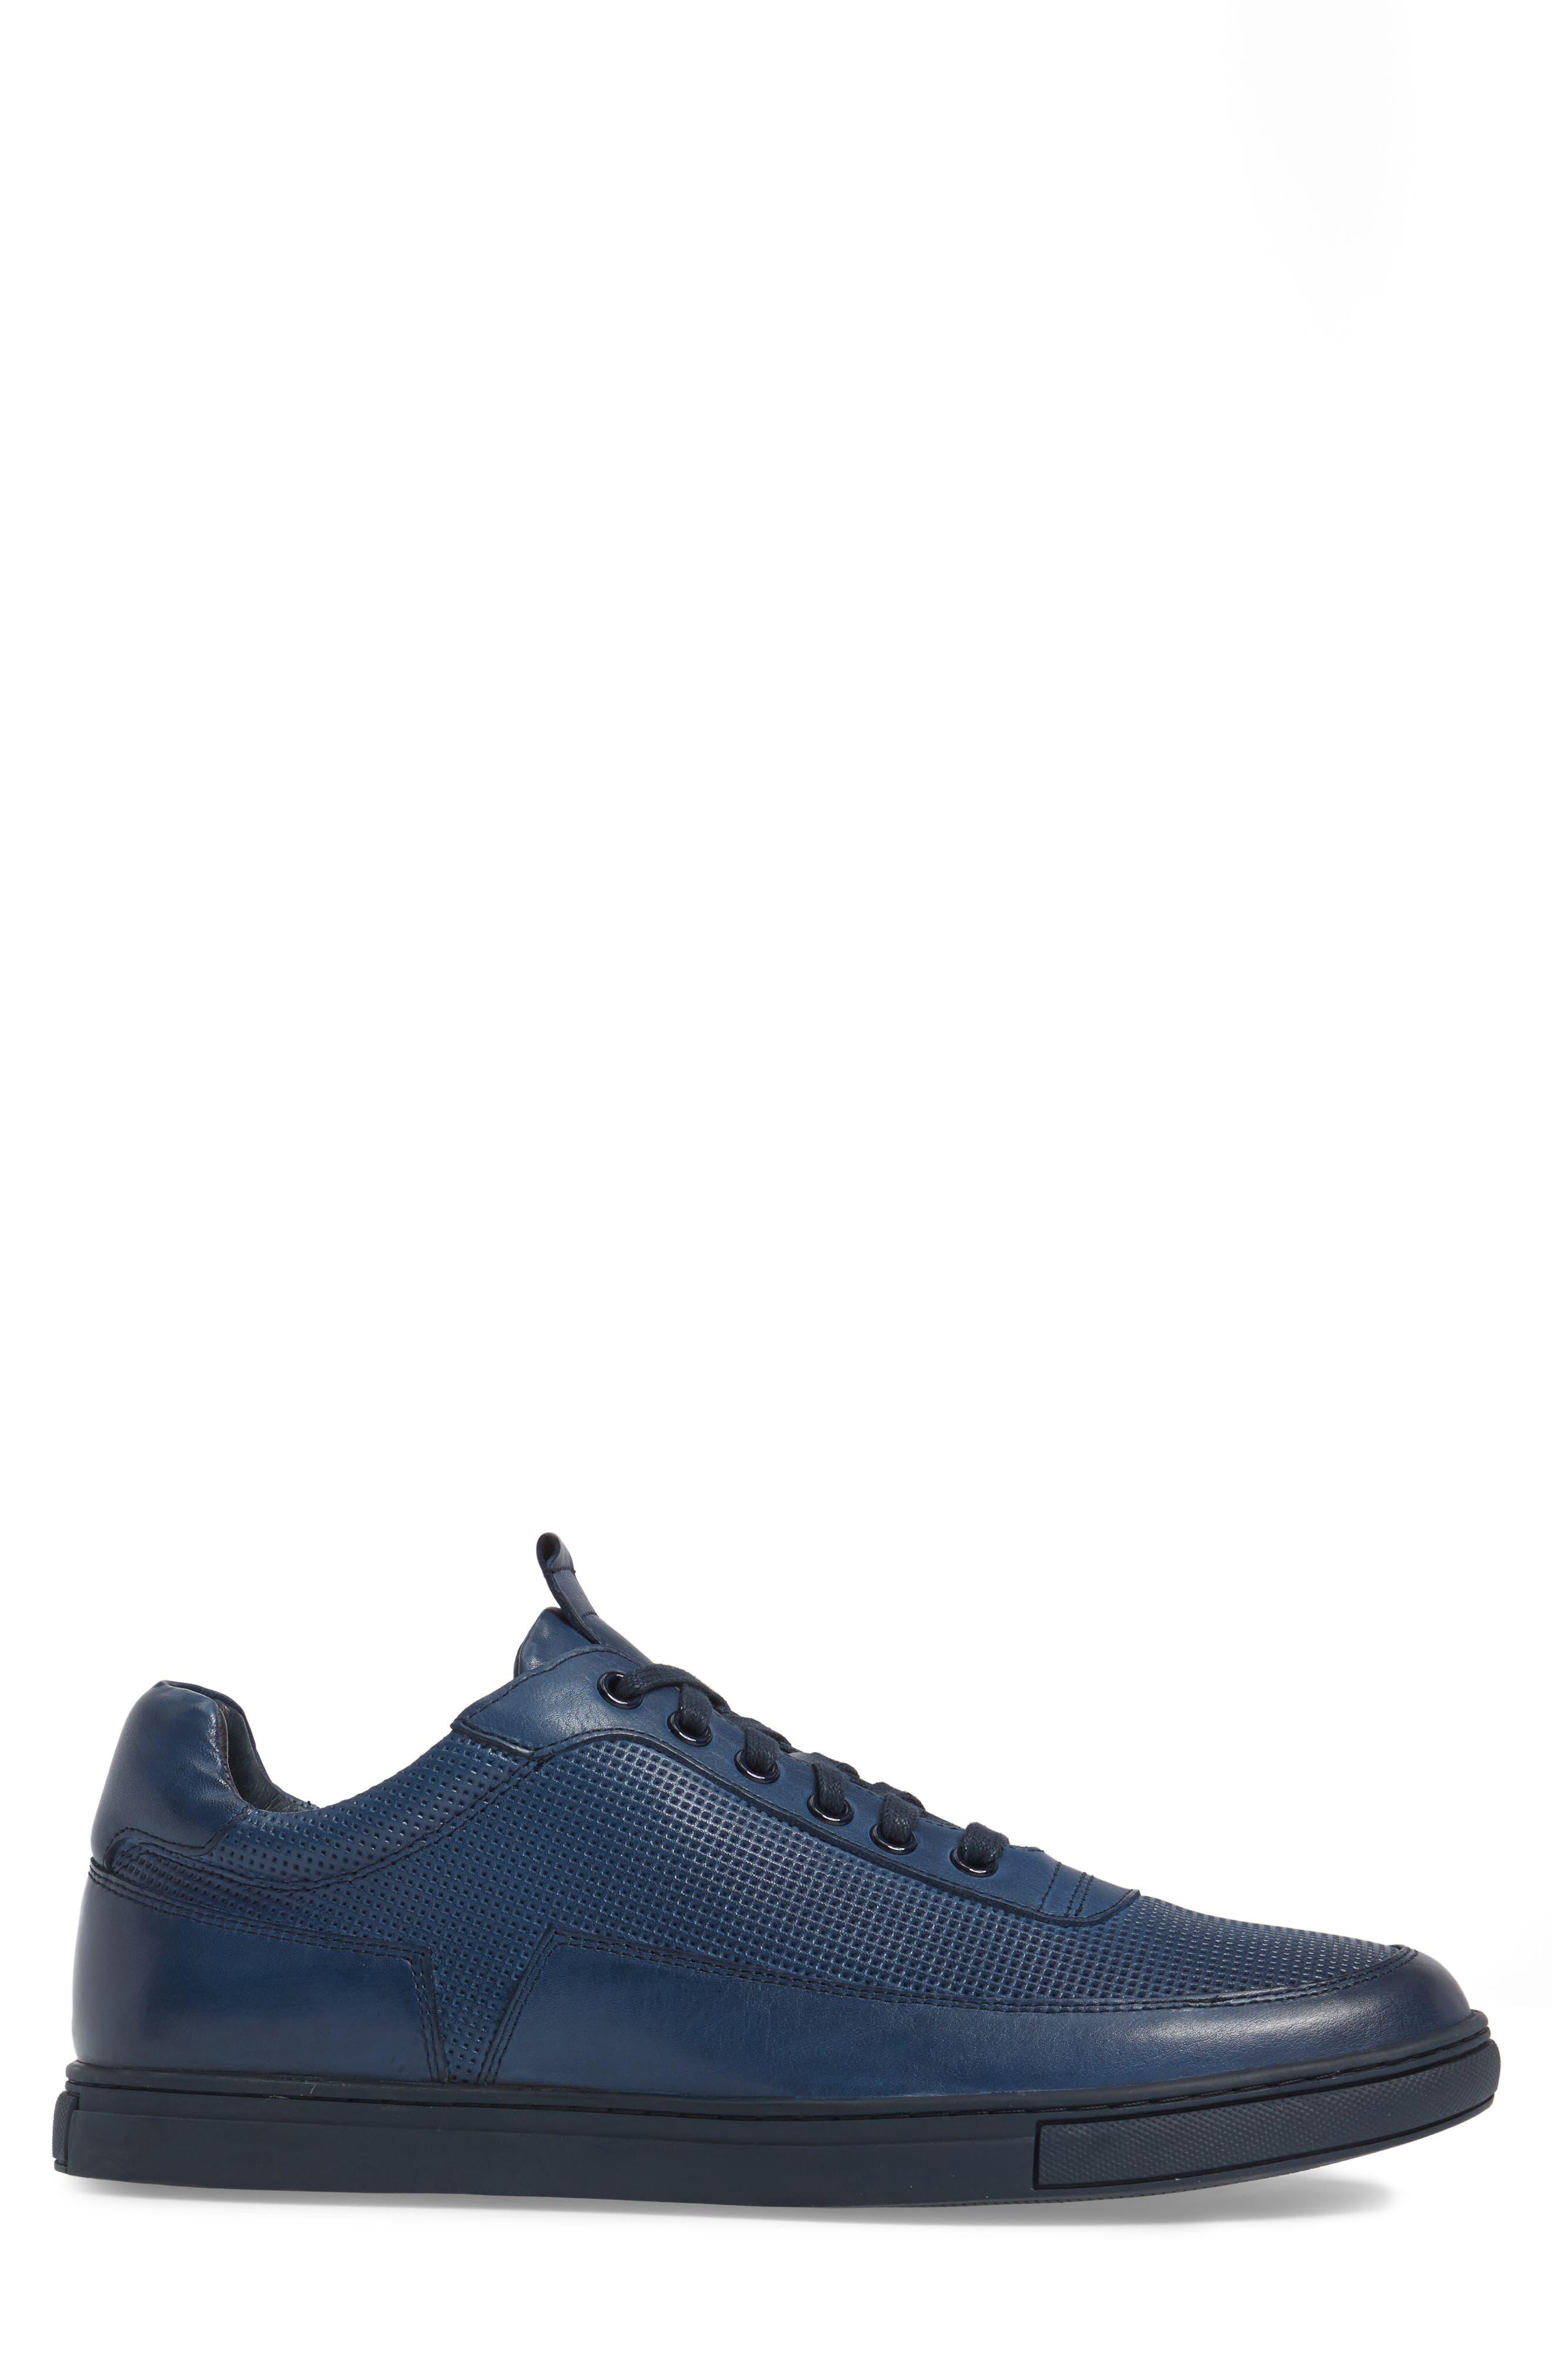 ZANZARA, Harmony Sneaker, Alternate thumbnail 3, color, BLUE LEATHER